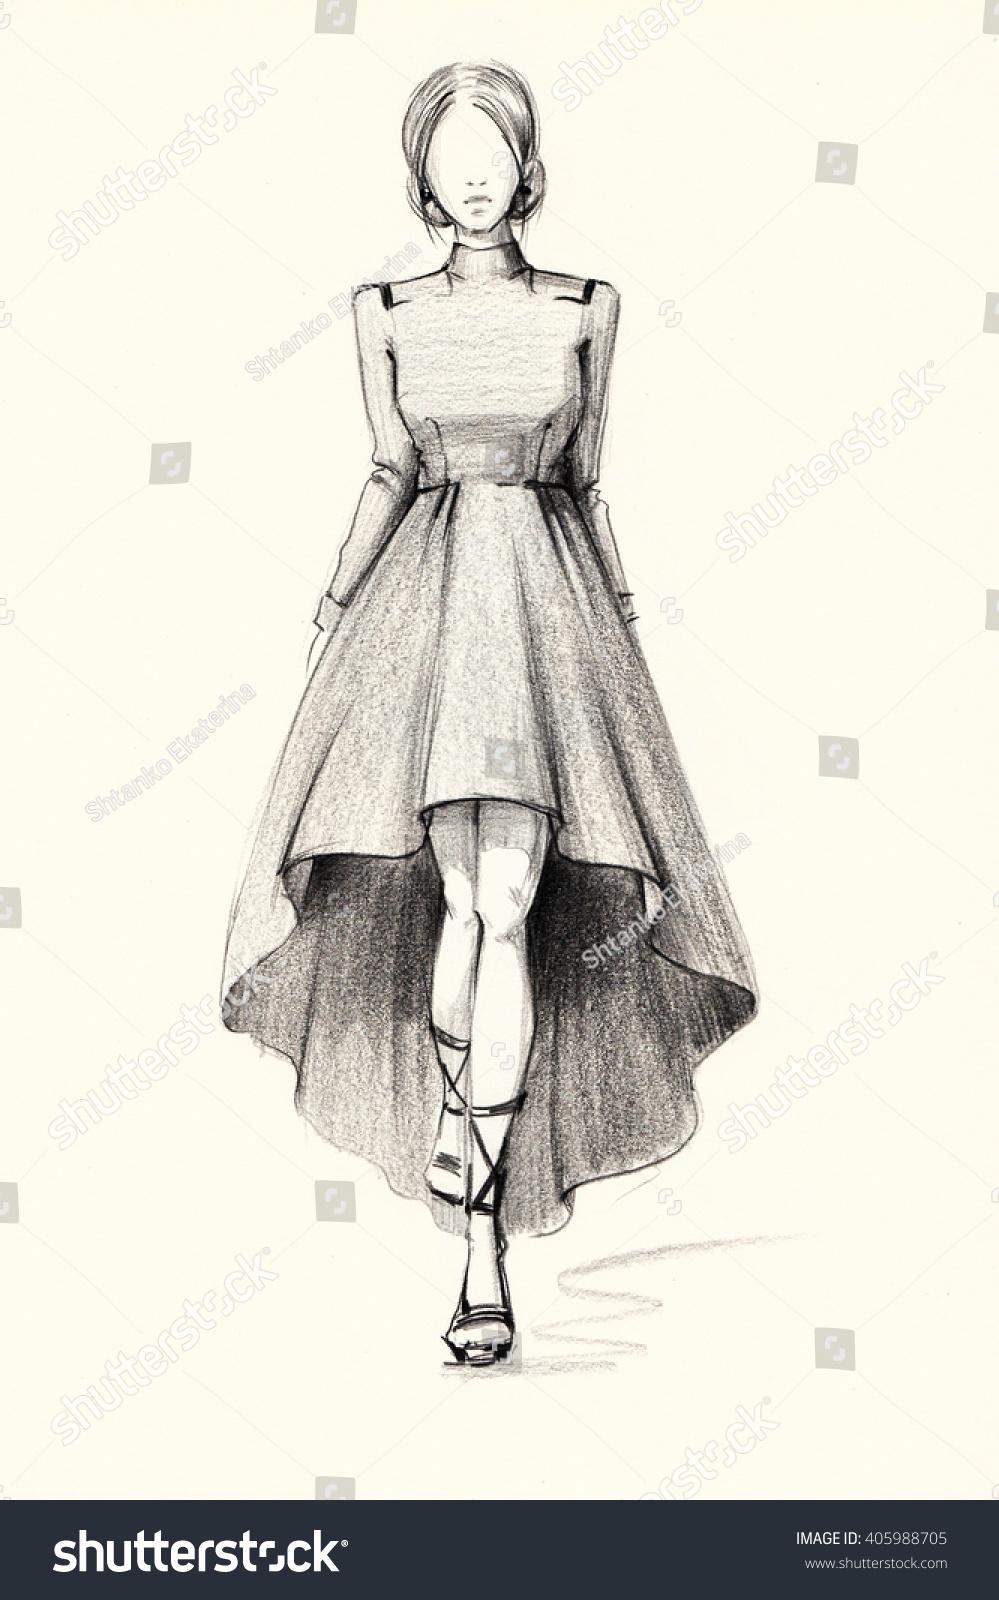 Fashion illustration stylish image sketch dress stock illustration